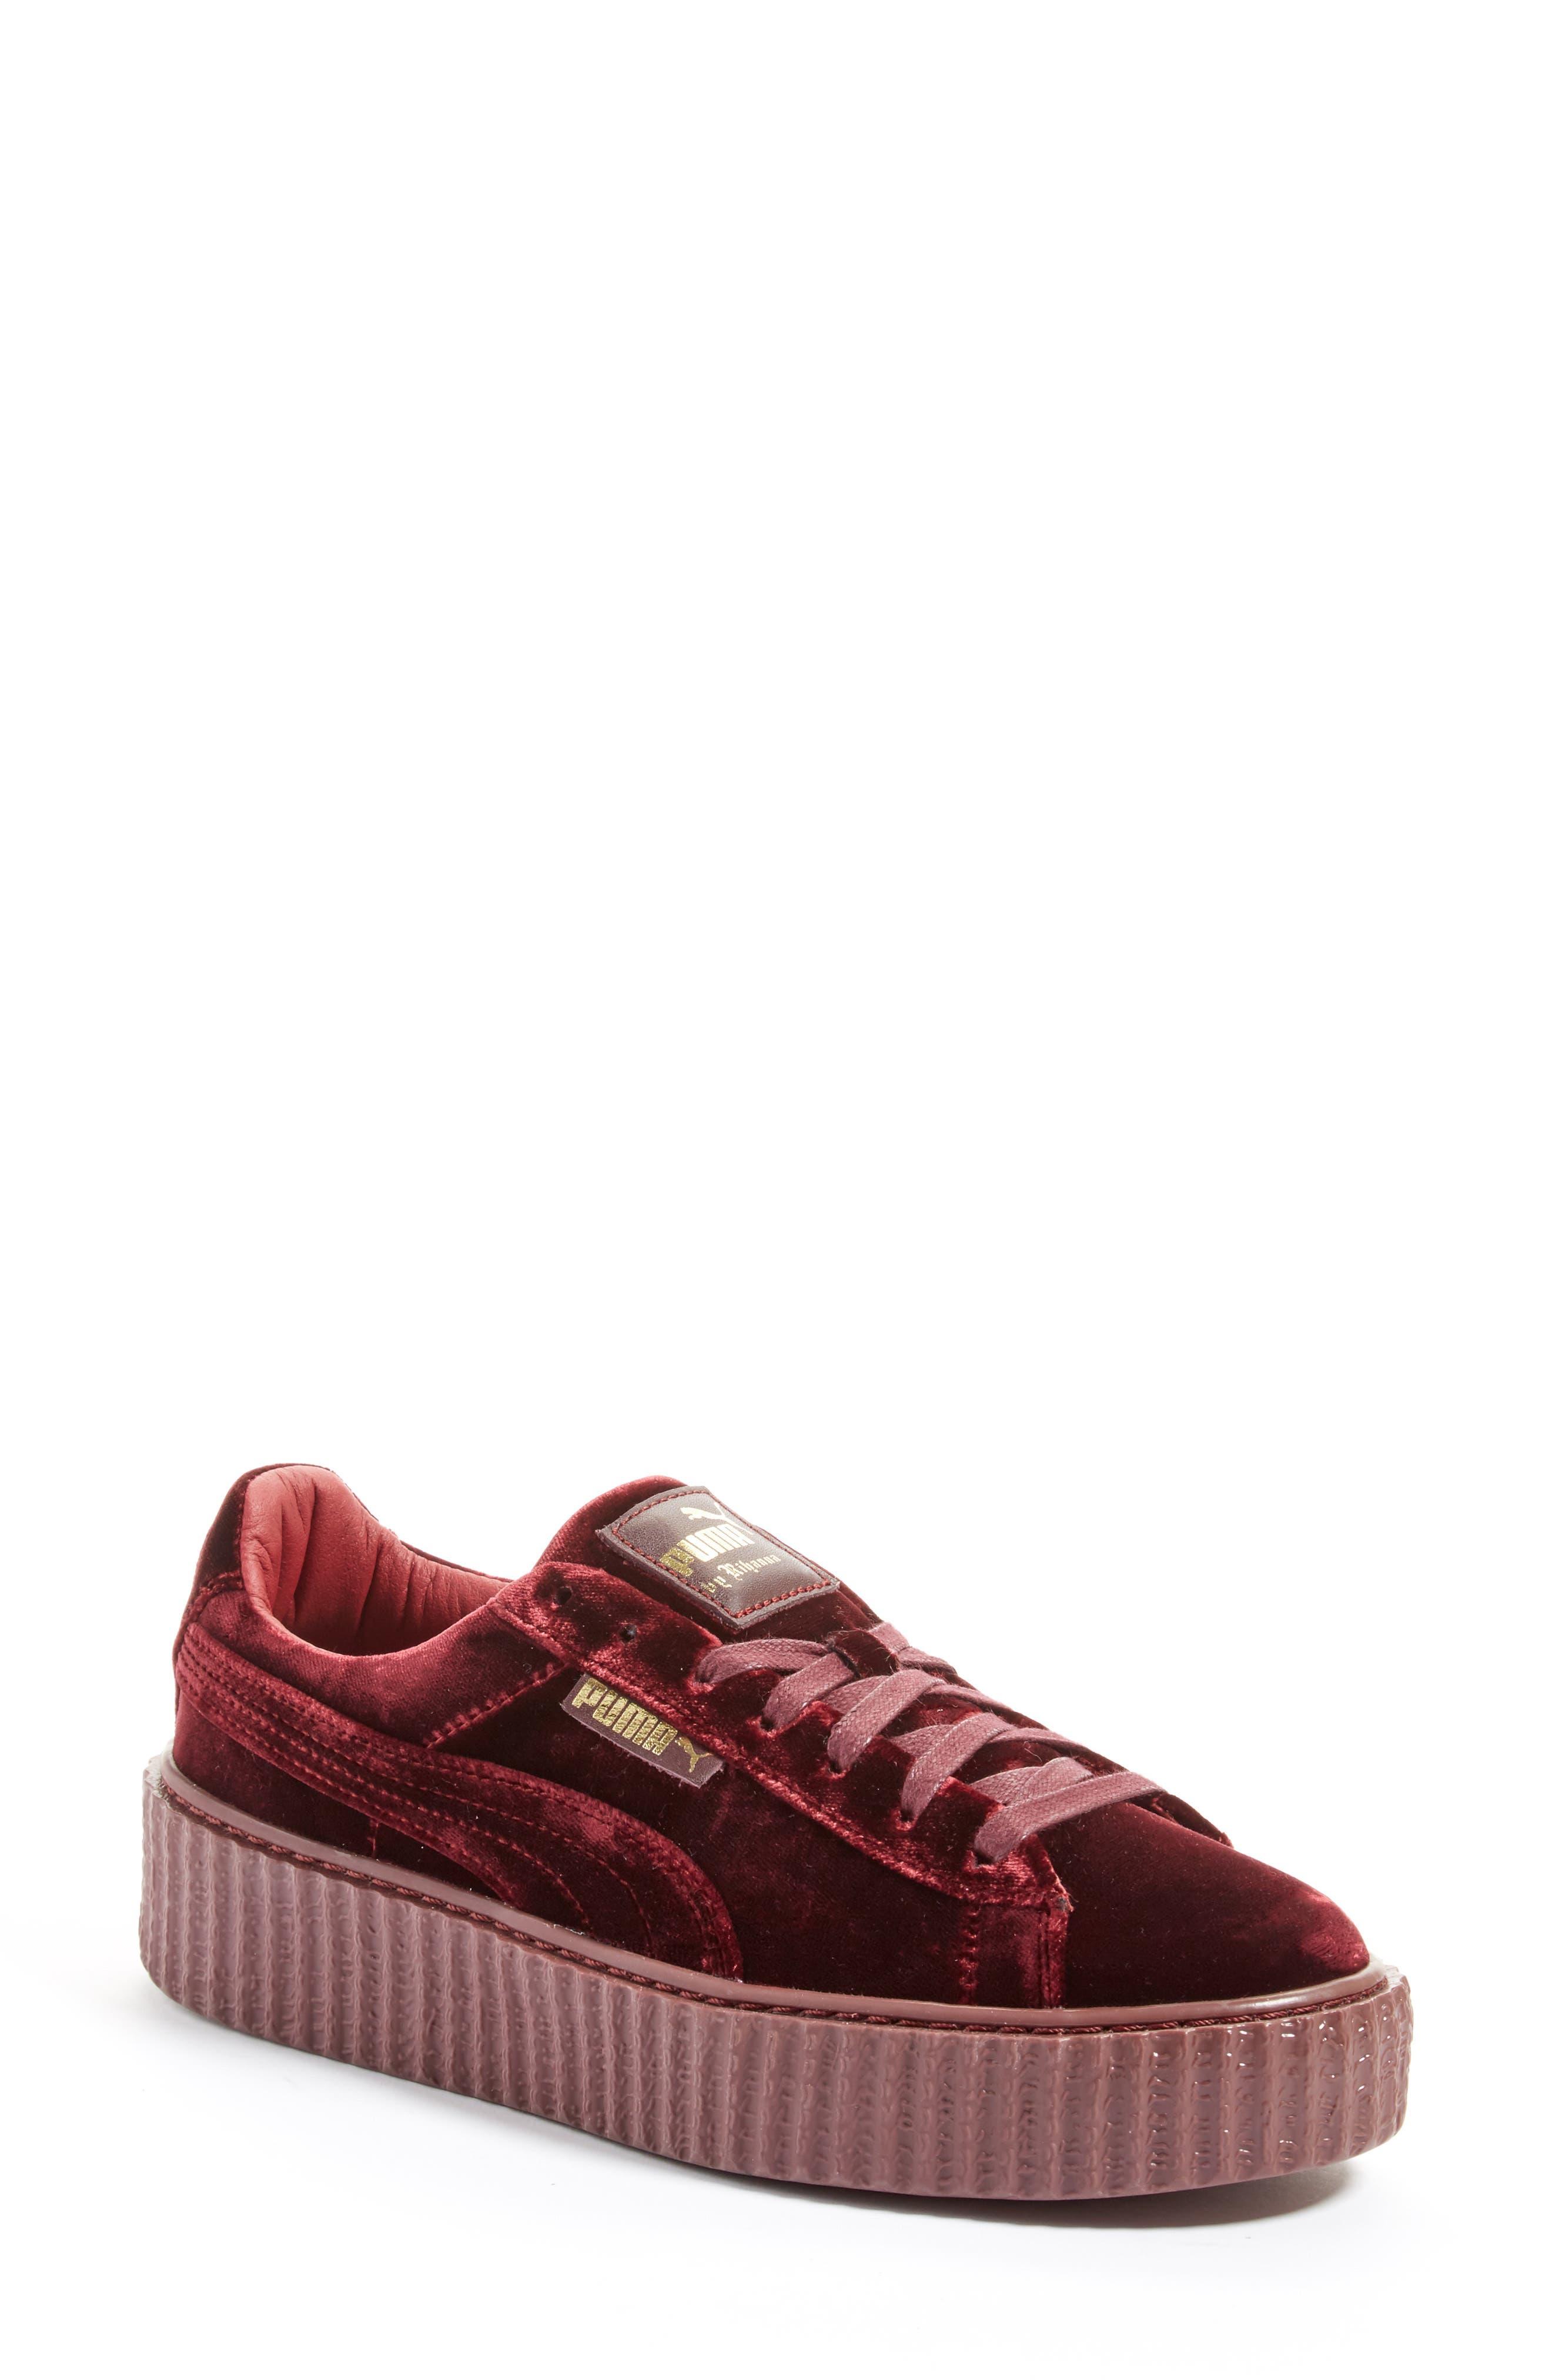 FENTY PUMA by Rihanna Creeper Sneaker,                             Main thumbnail 12, color,